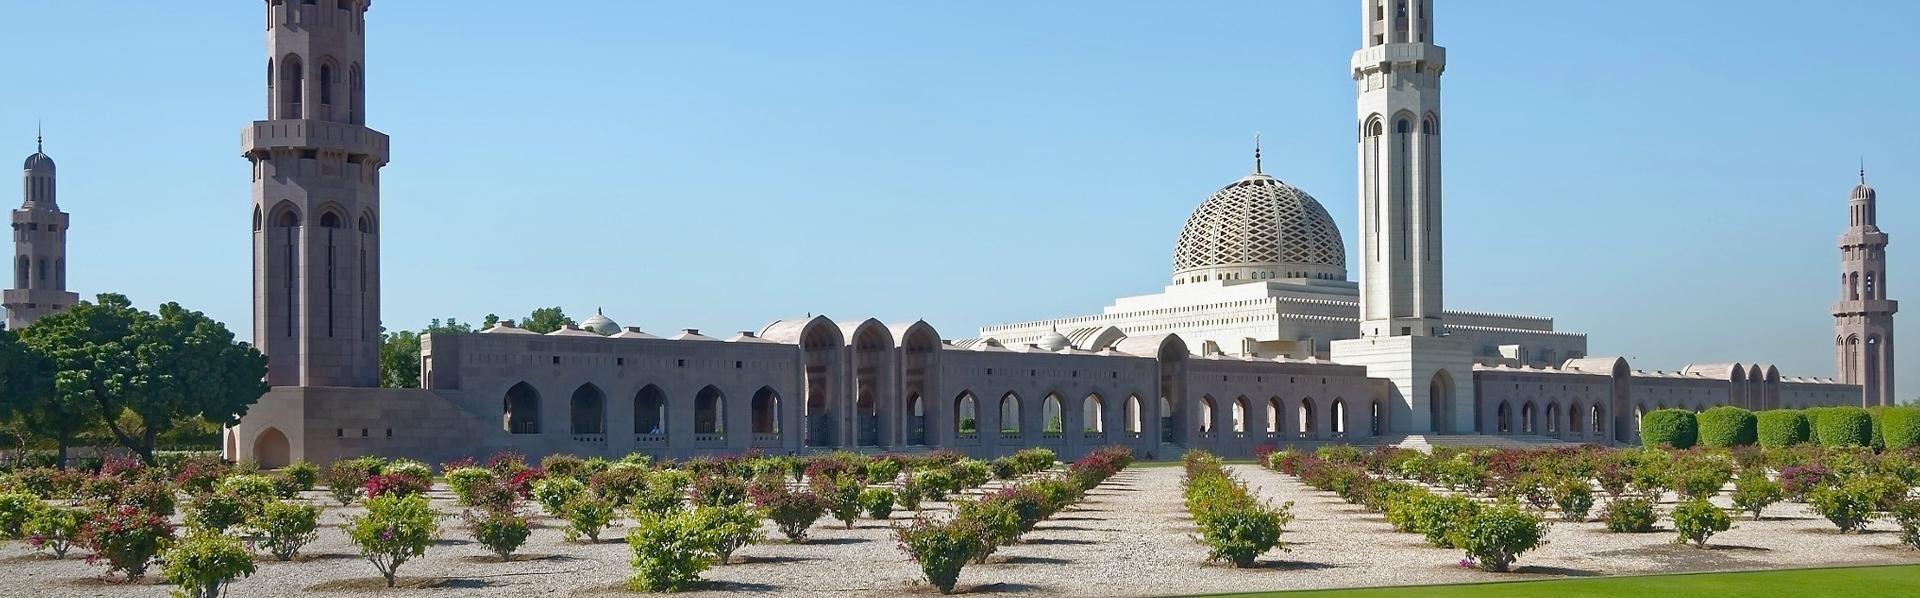 De Grote Moskee in Muscat, Oman